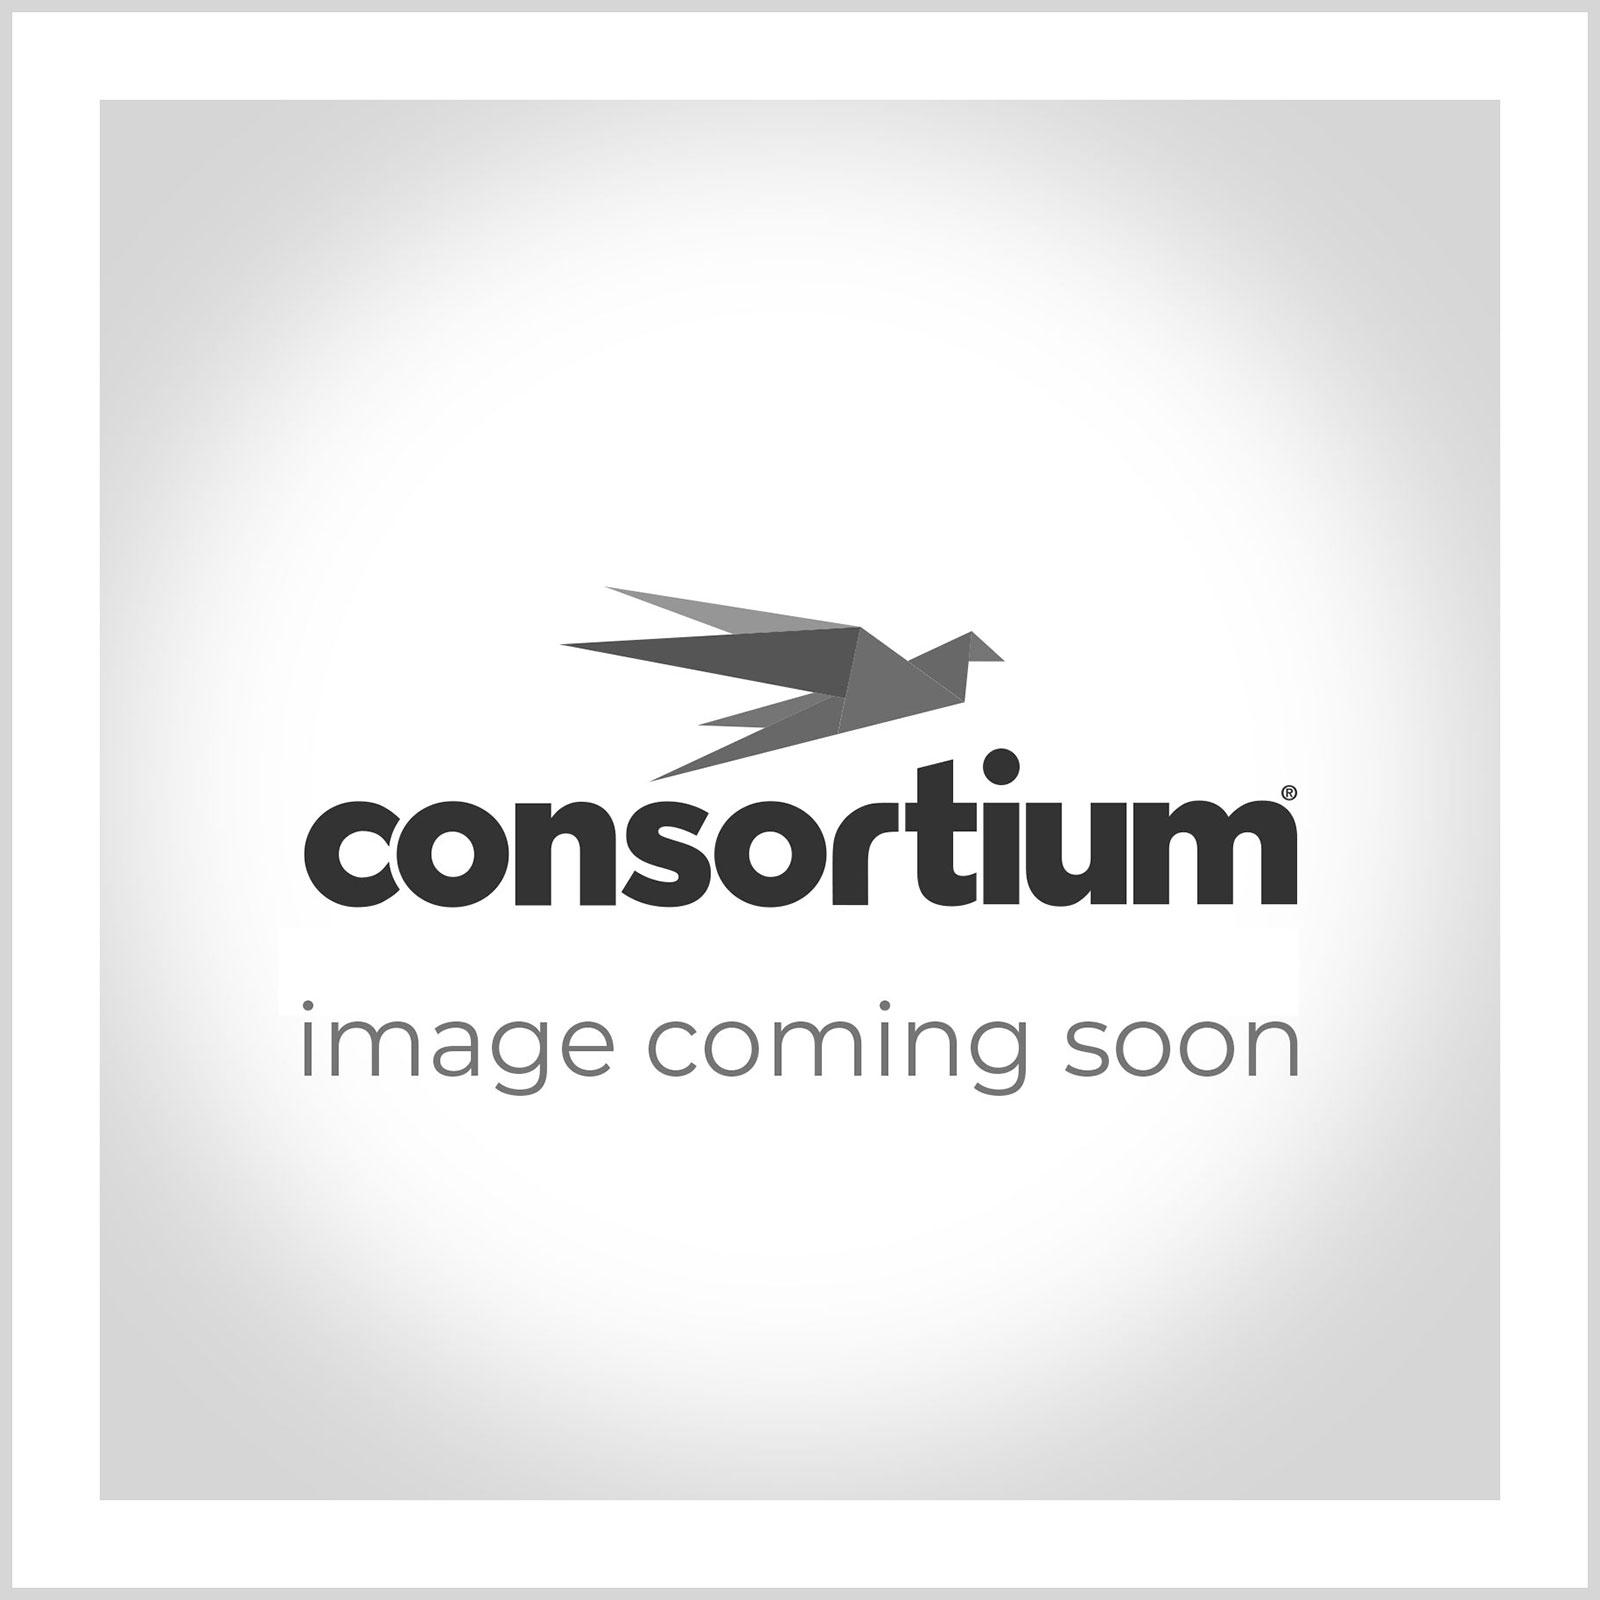 King (Casper) Nativity